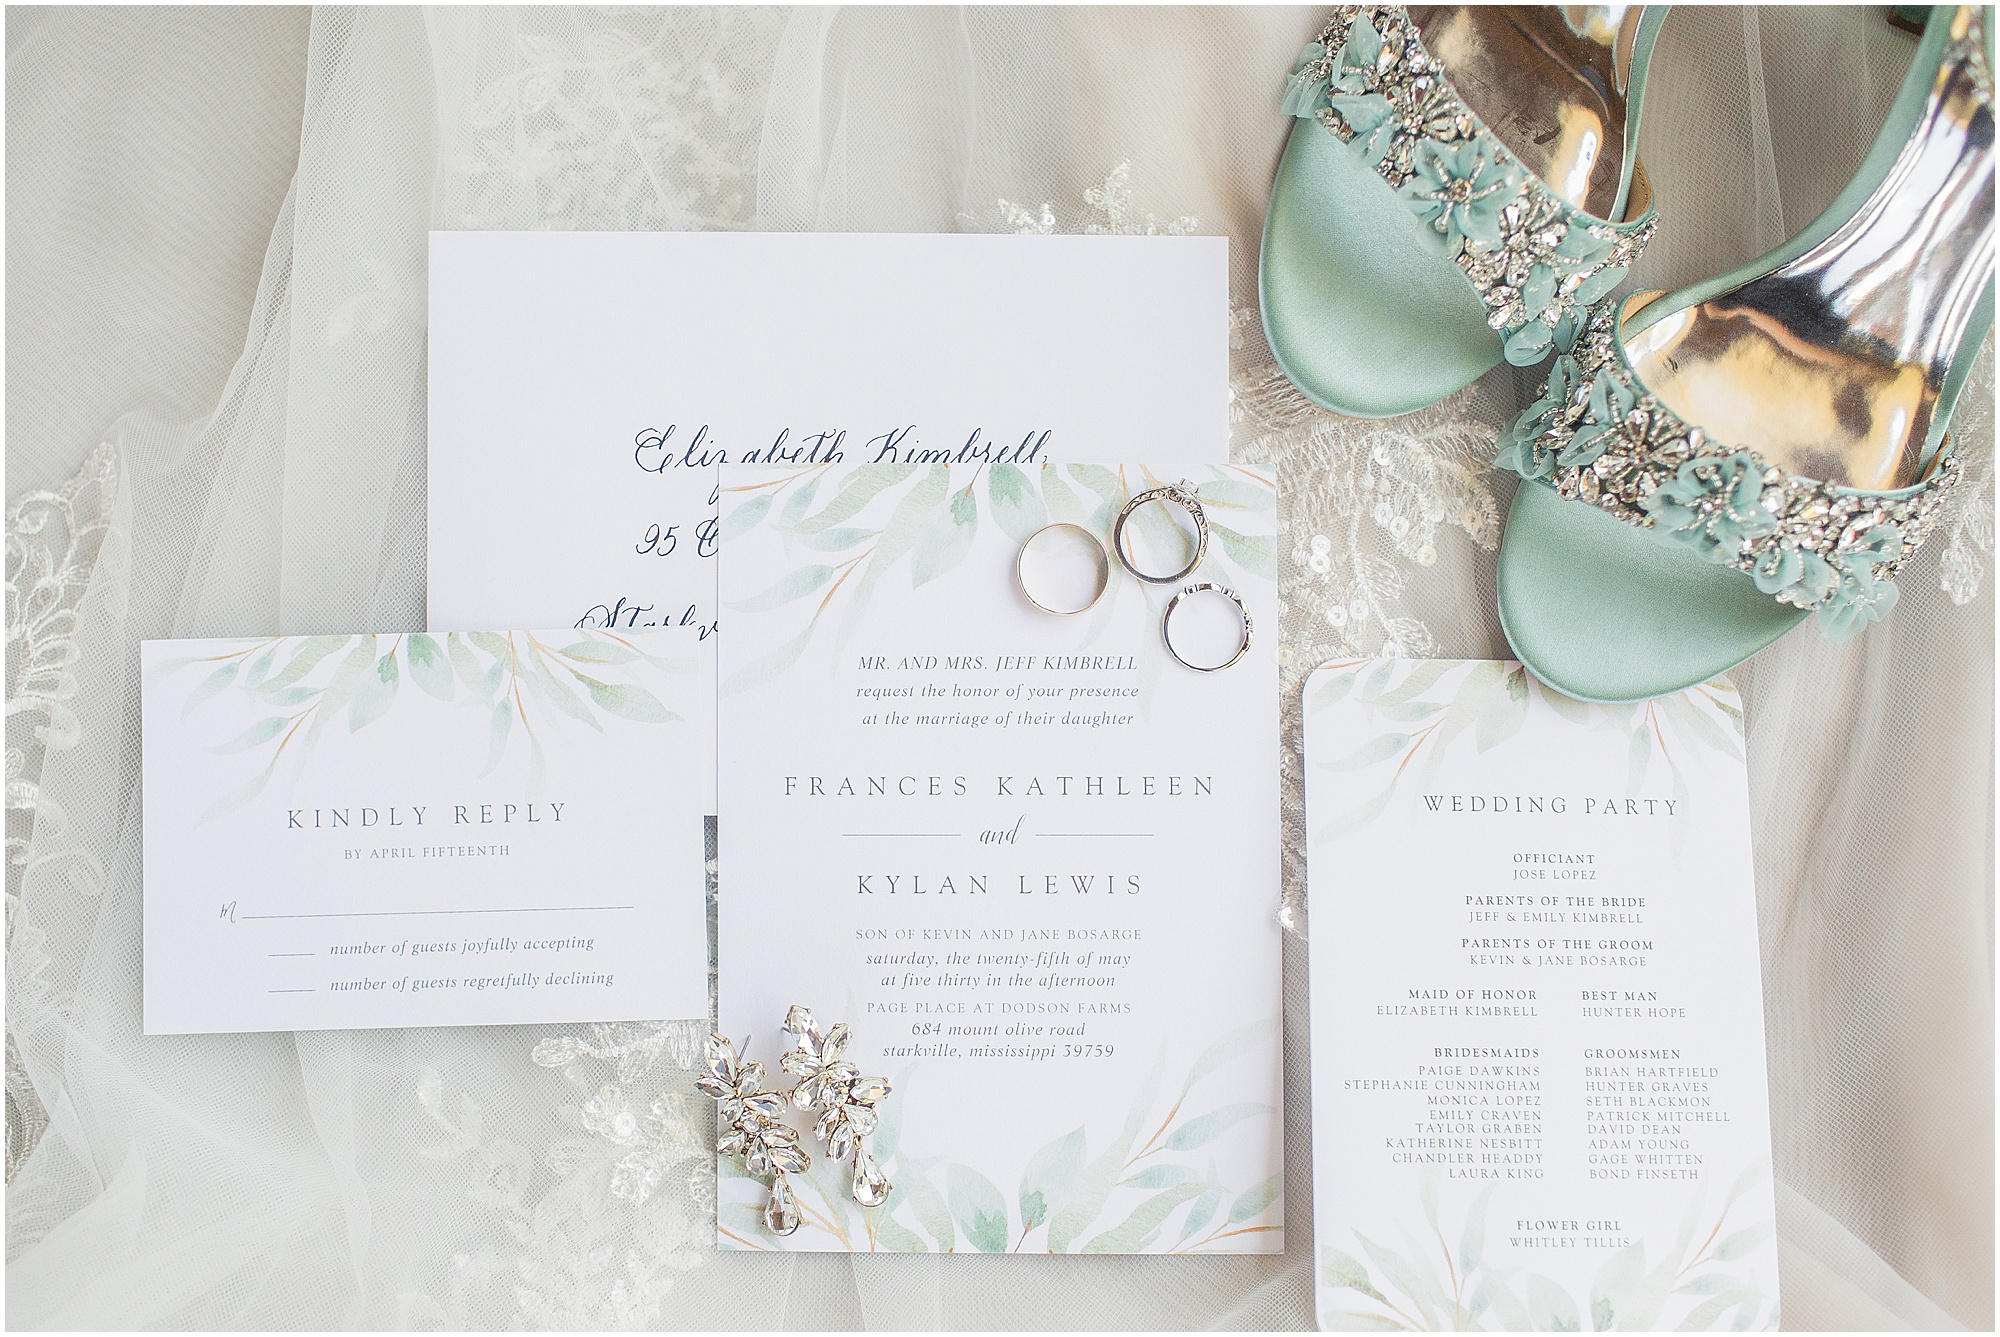 starkville-mississippi-wedding-page-place-dodson-farms_0005.jpg